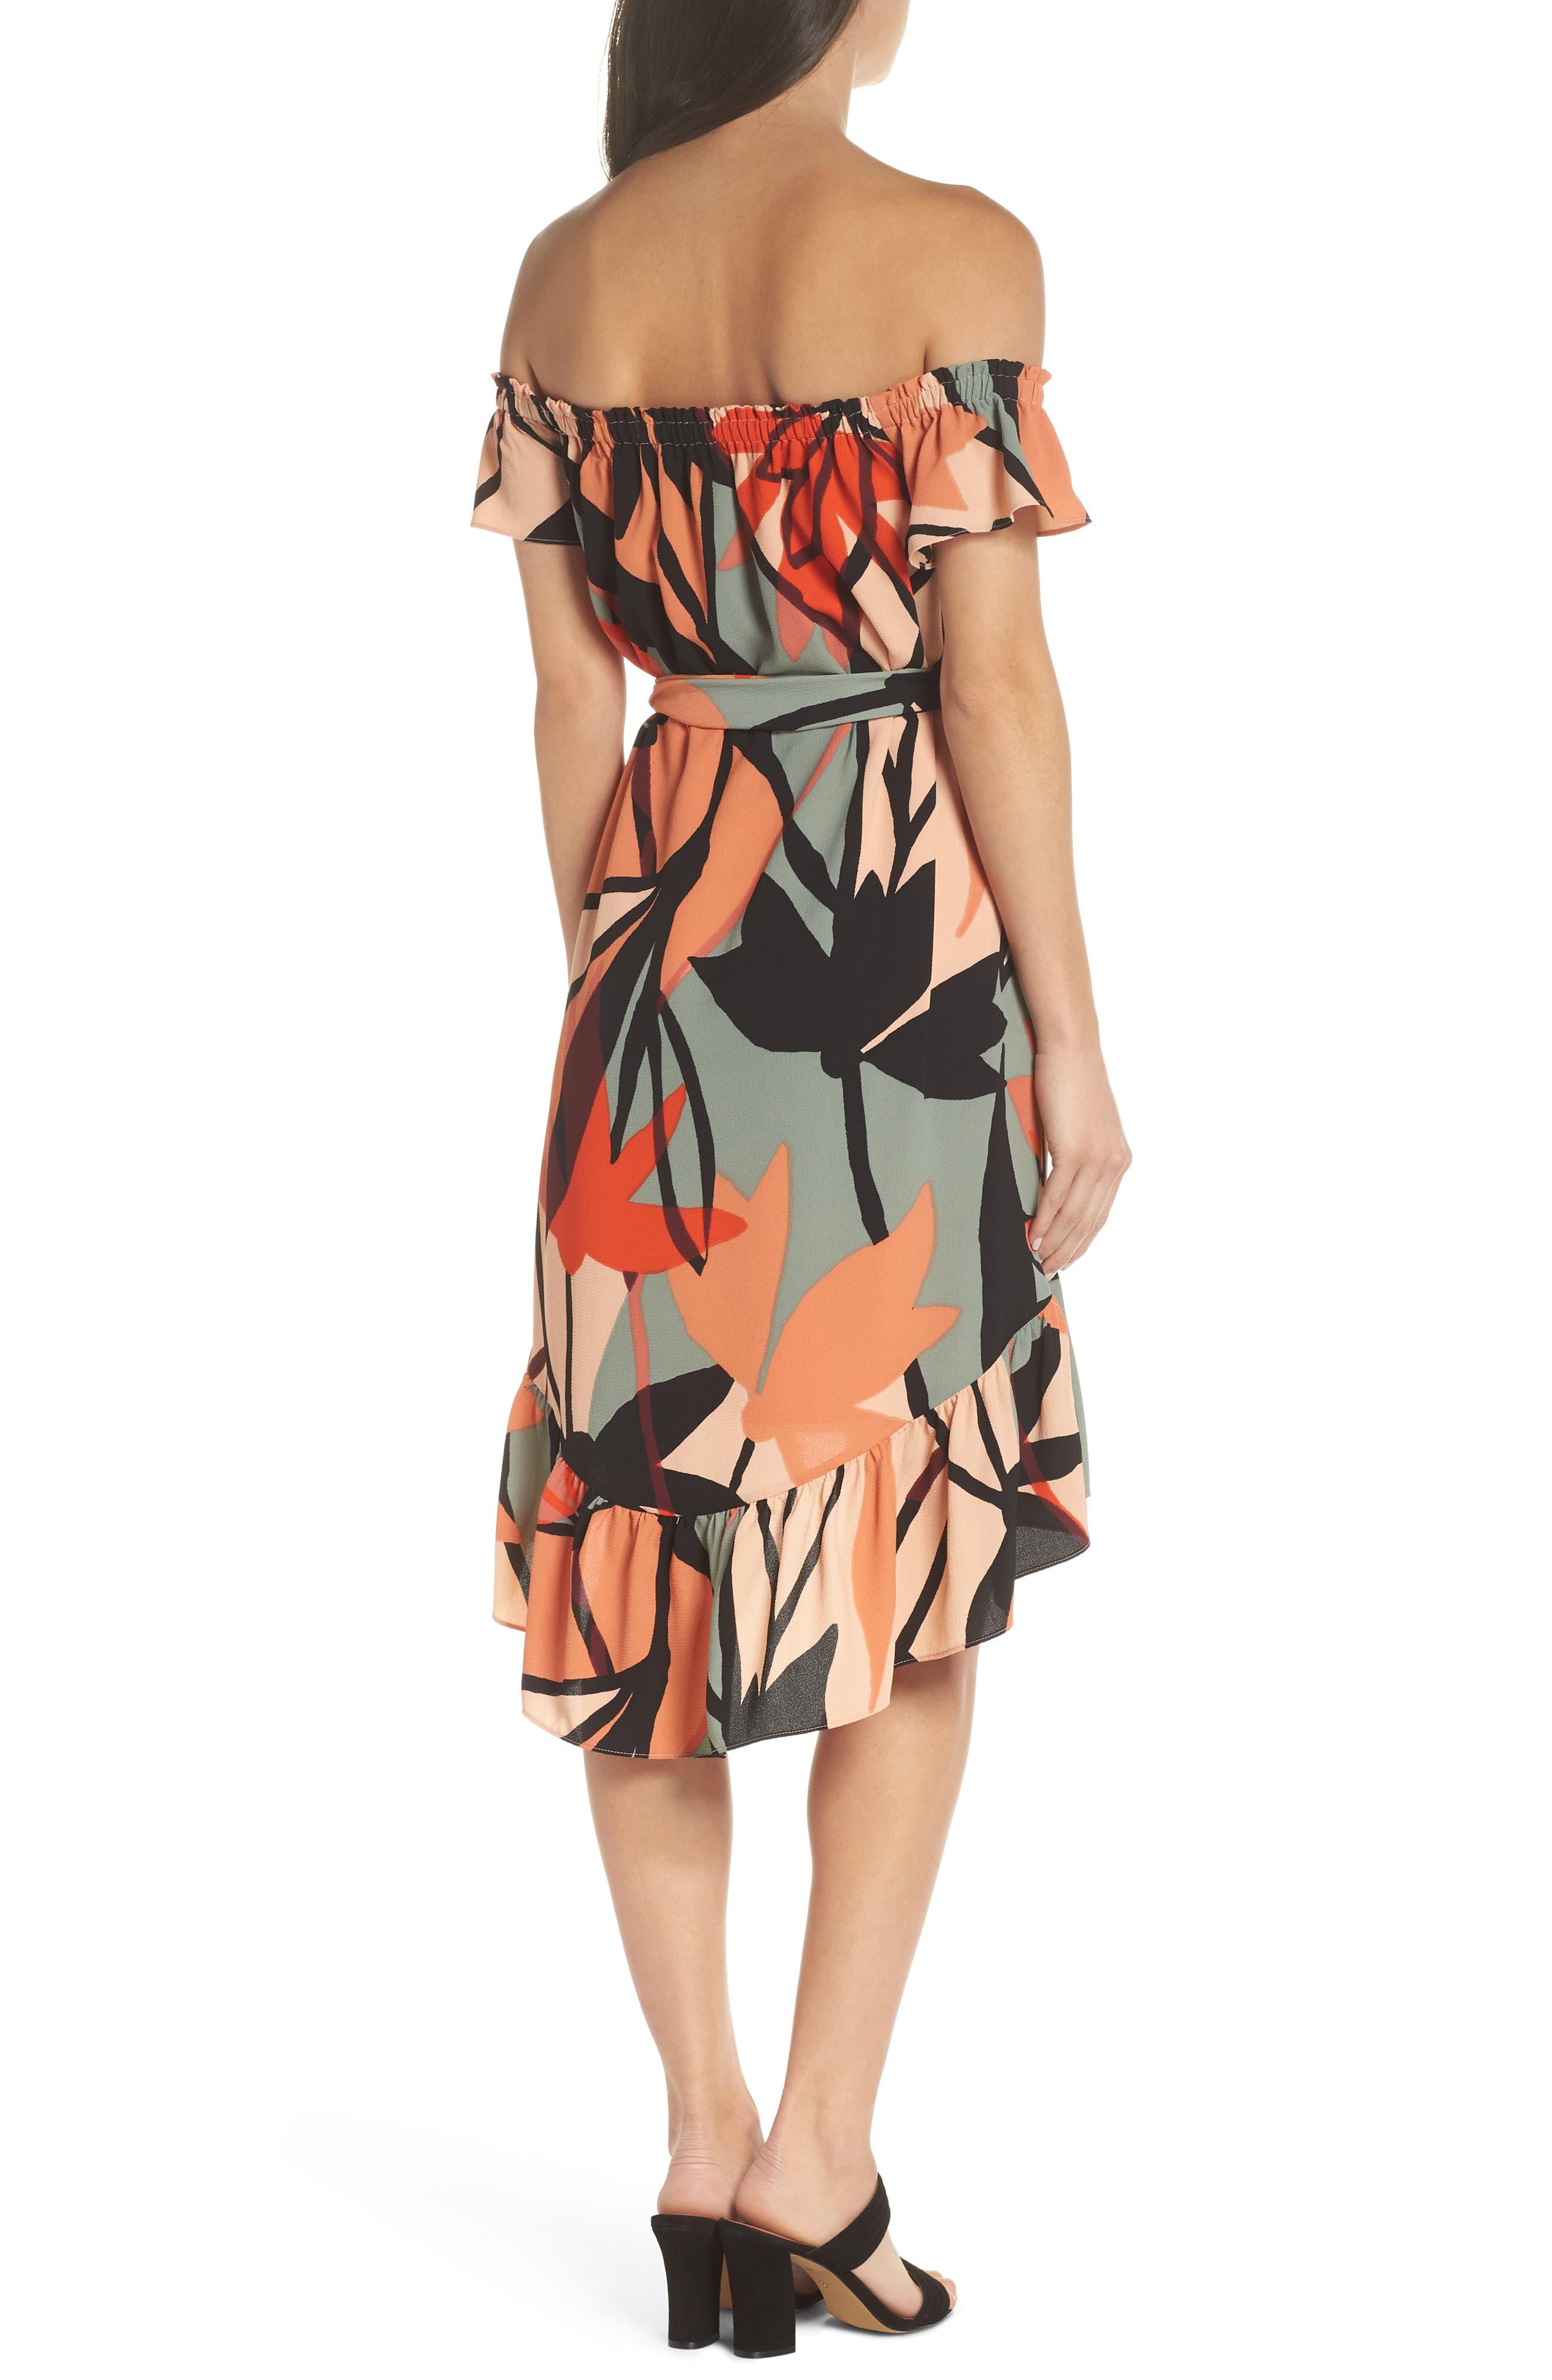 CLOVER AND SLOANE,                             Off the Shoulder Bubble Crepe Dress,                             Alternate thumbnail 2, color,                             800